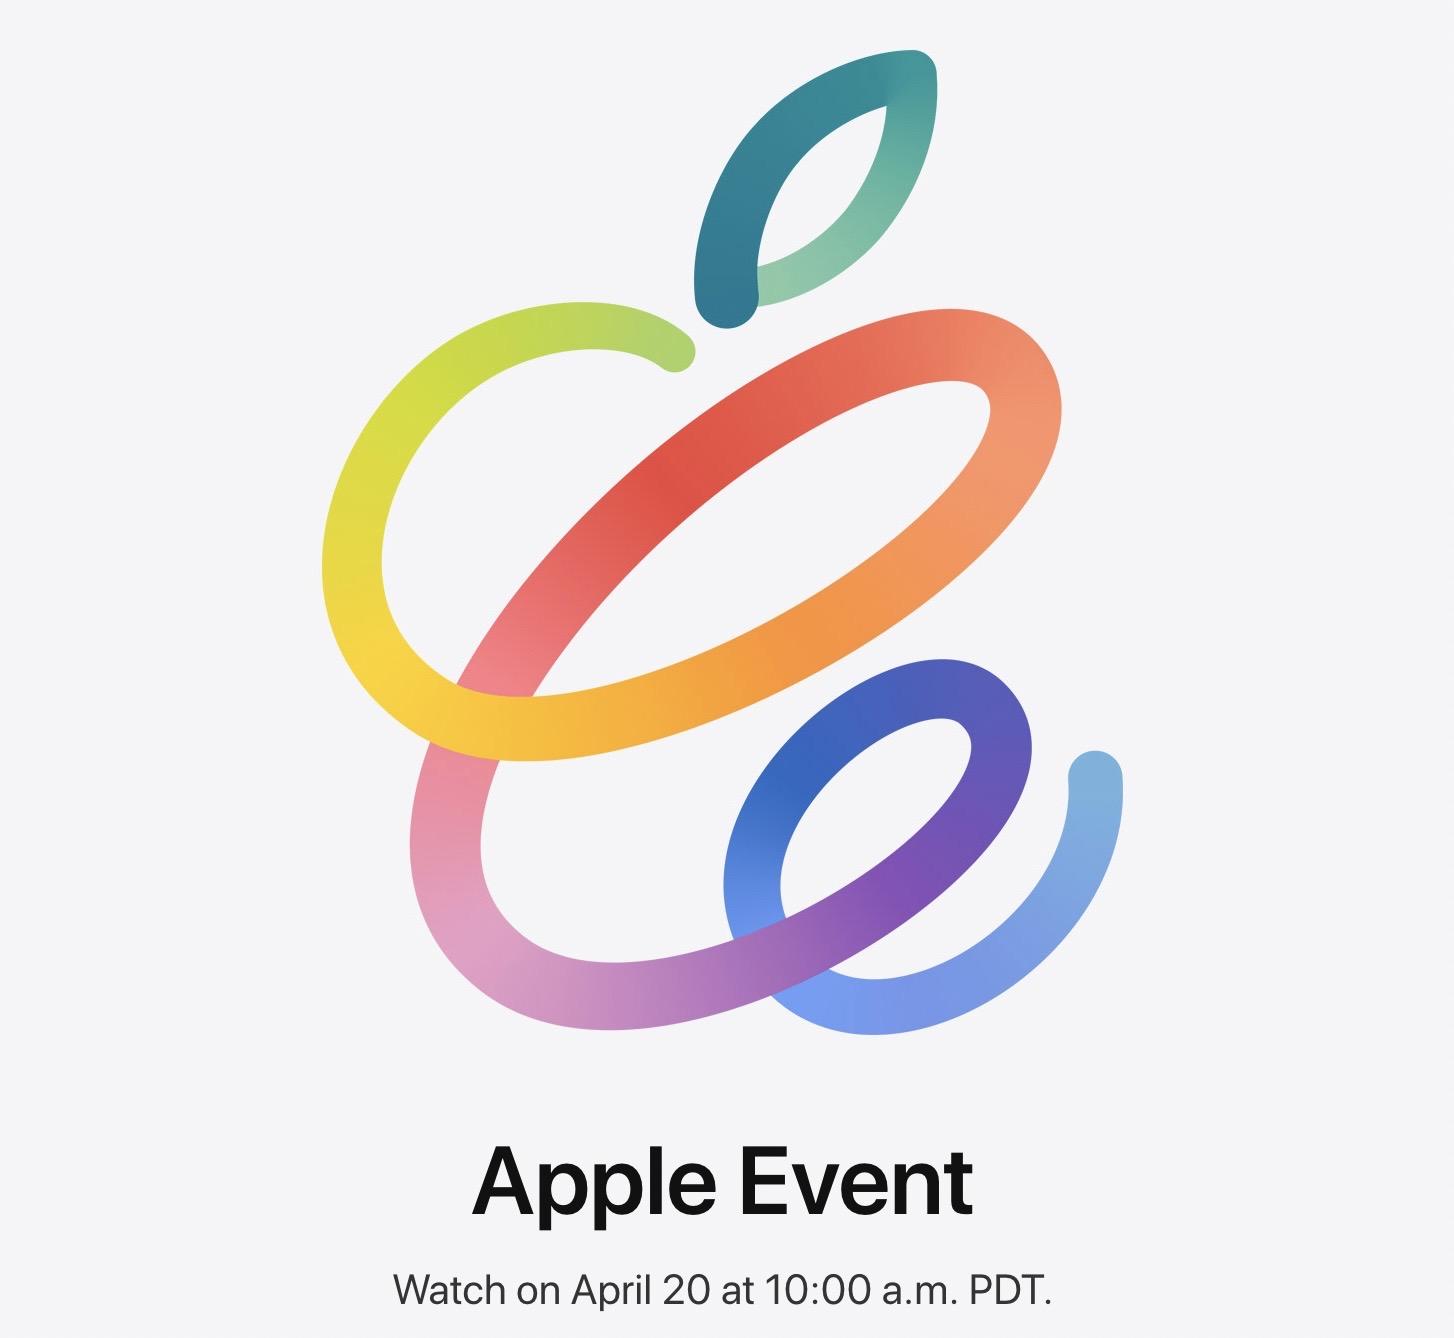 Apple event 14